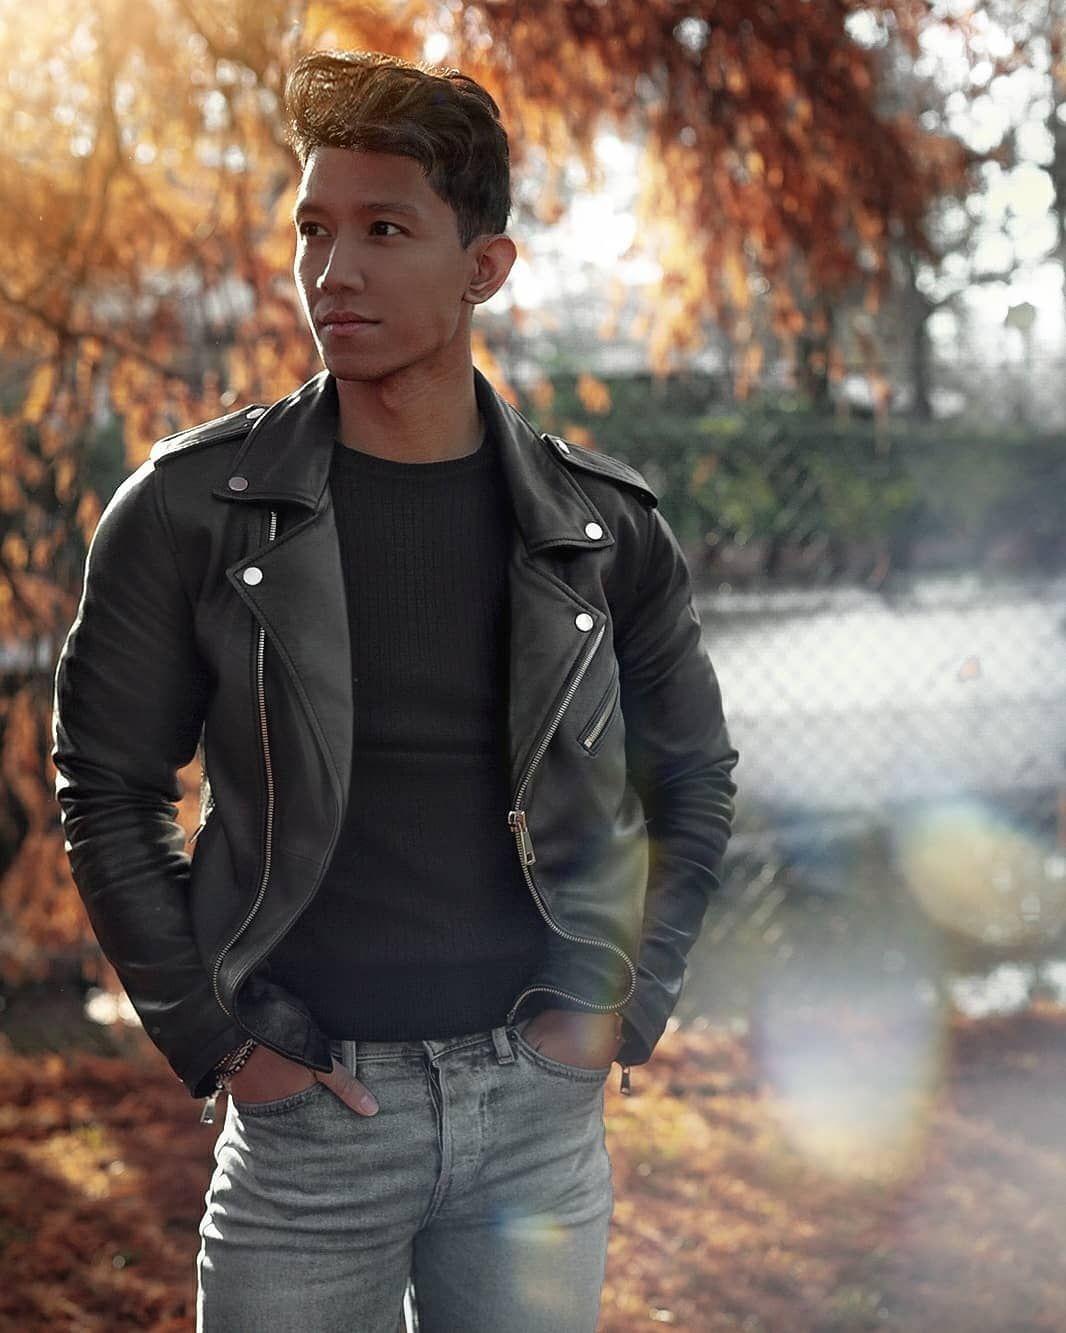 Mensfashion Karl On Instagram The Leather Jacket The Leather Jacket Is Such A Clas Leather Jeans Men Leather Jacket Outfit Men Leather Jacket Men Style [ 1333 x 1066 Pixel ]